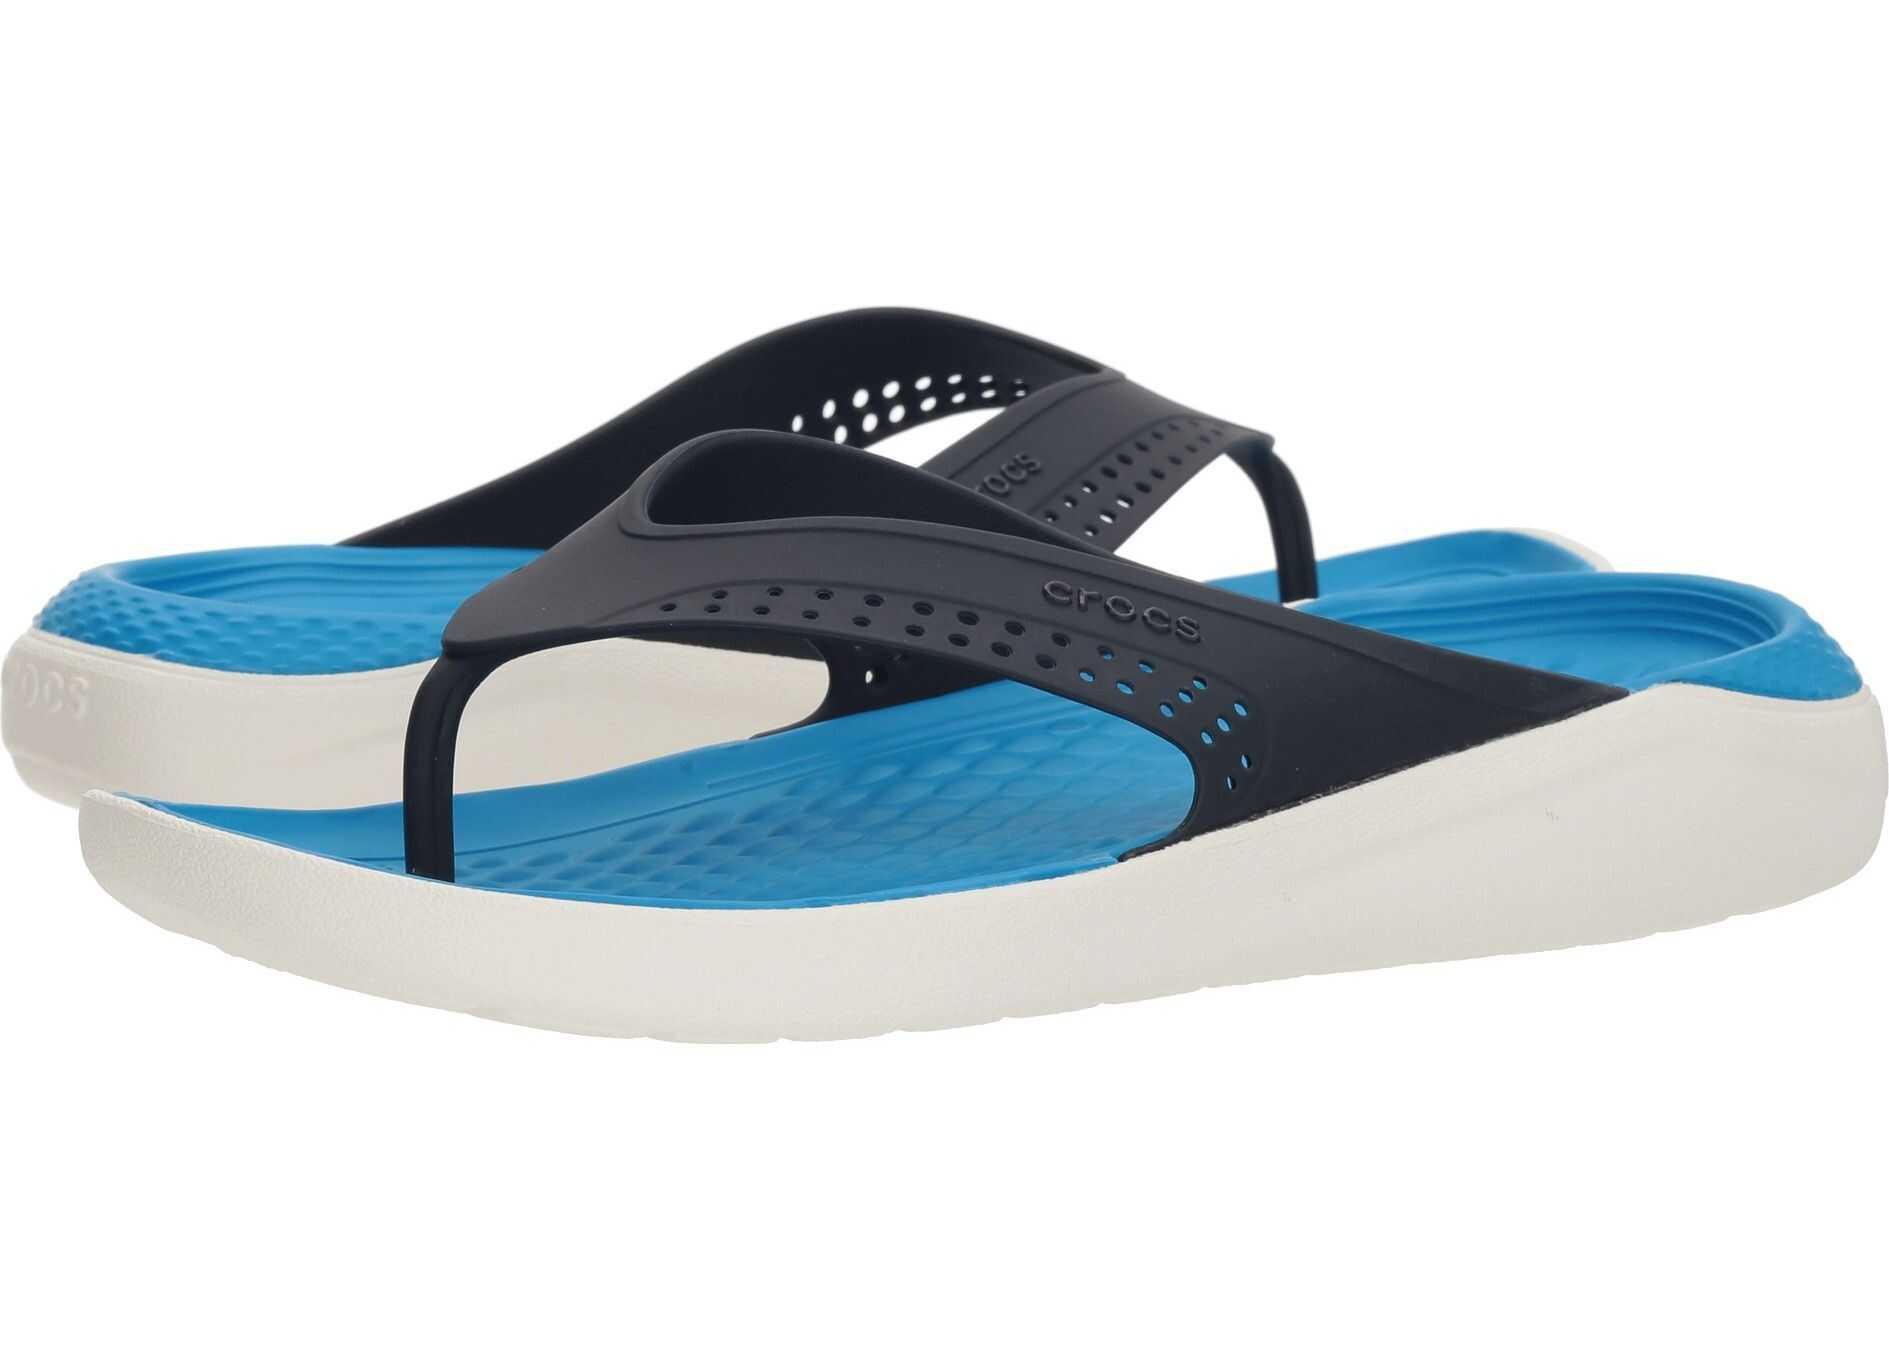 Crocs LiteRide Flip Navy/White